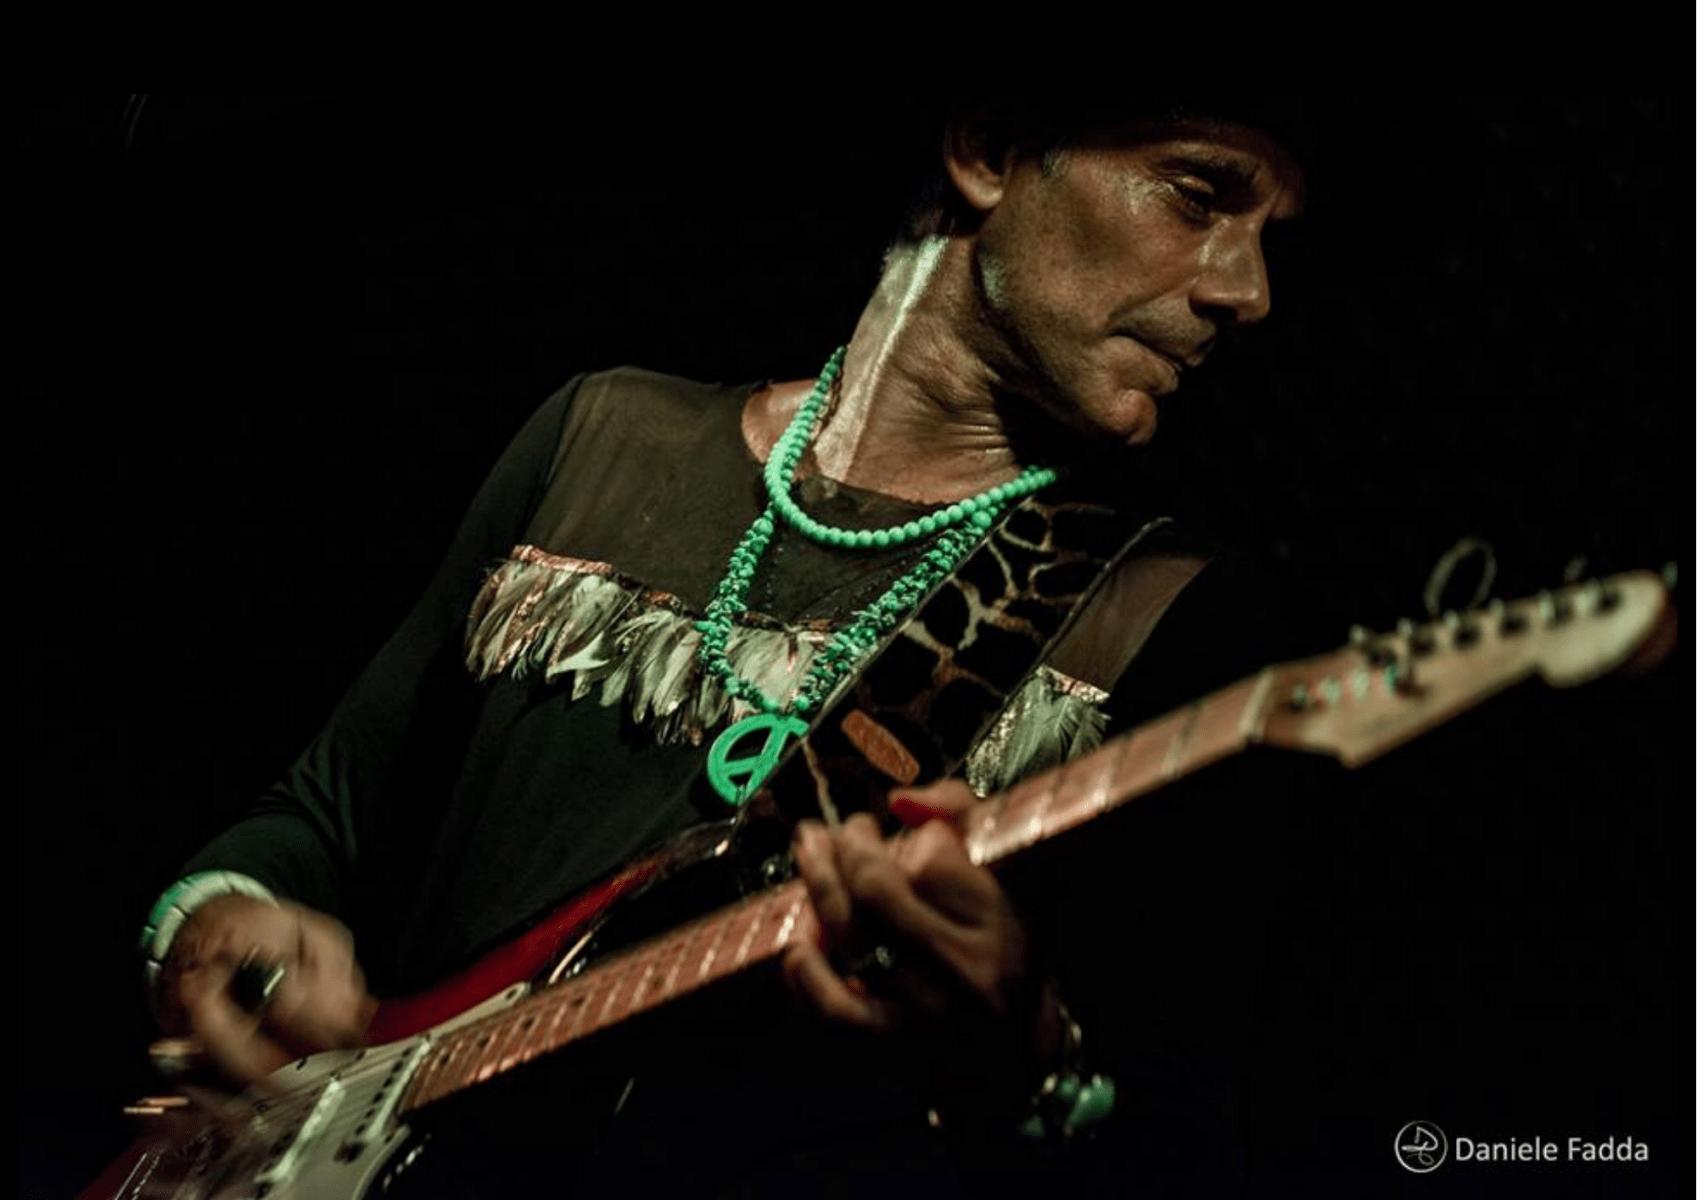 Salvatore Amara - Daniele Fadda - Talkin' Blues - Simone Murru - interviste - Cagliari Blues Radio Station - Sa Scena Sarda - 26 Aprile 2020